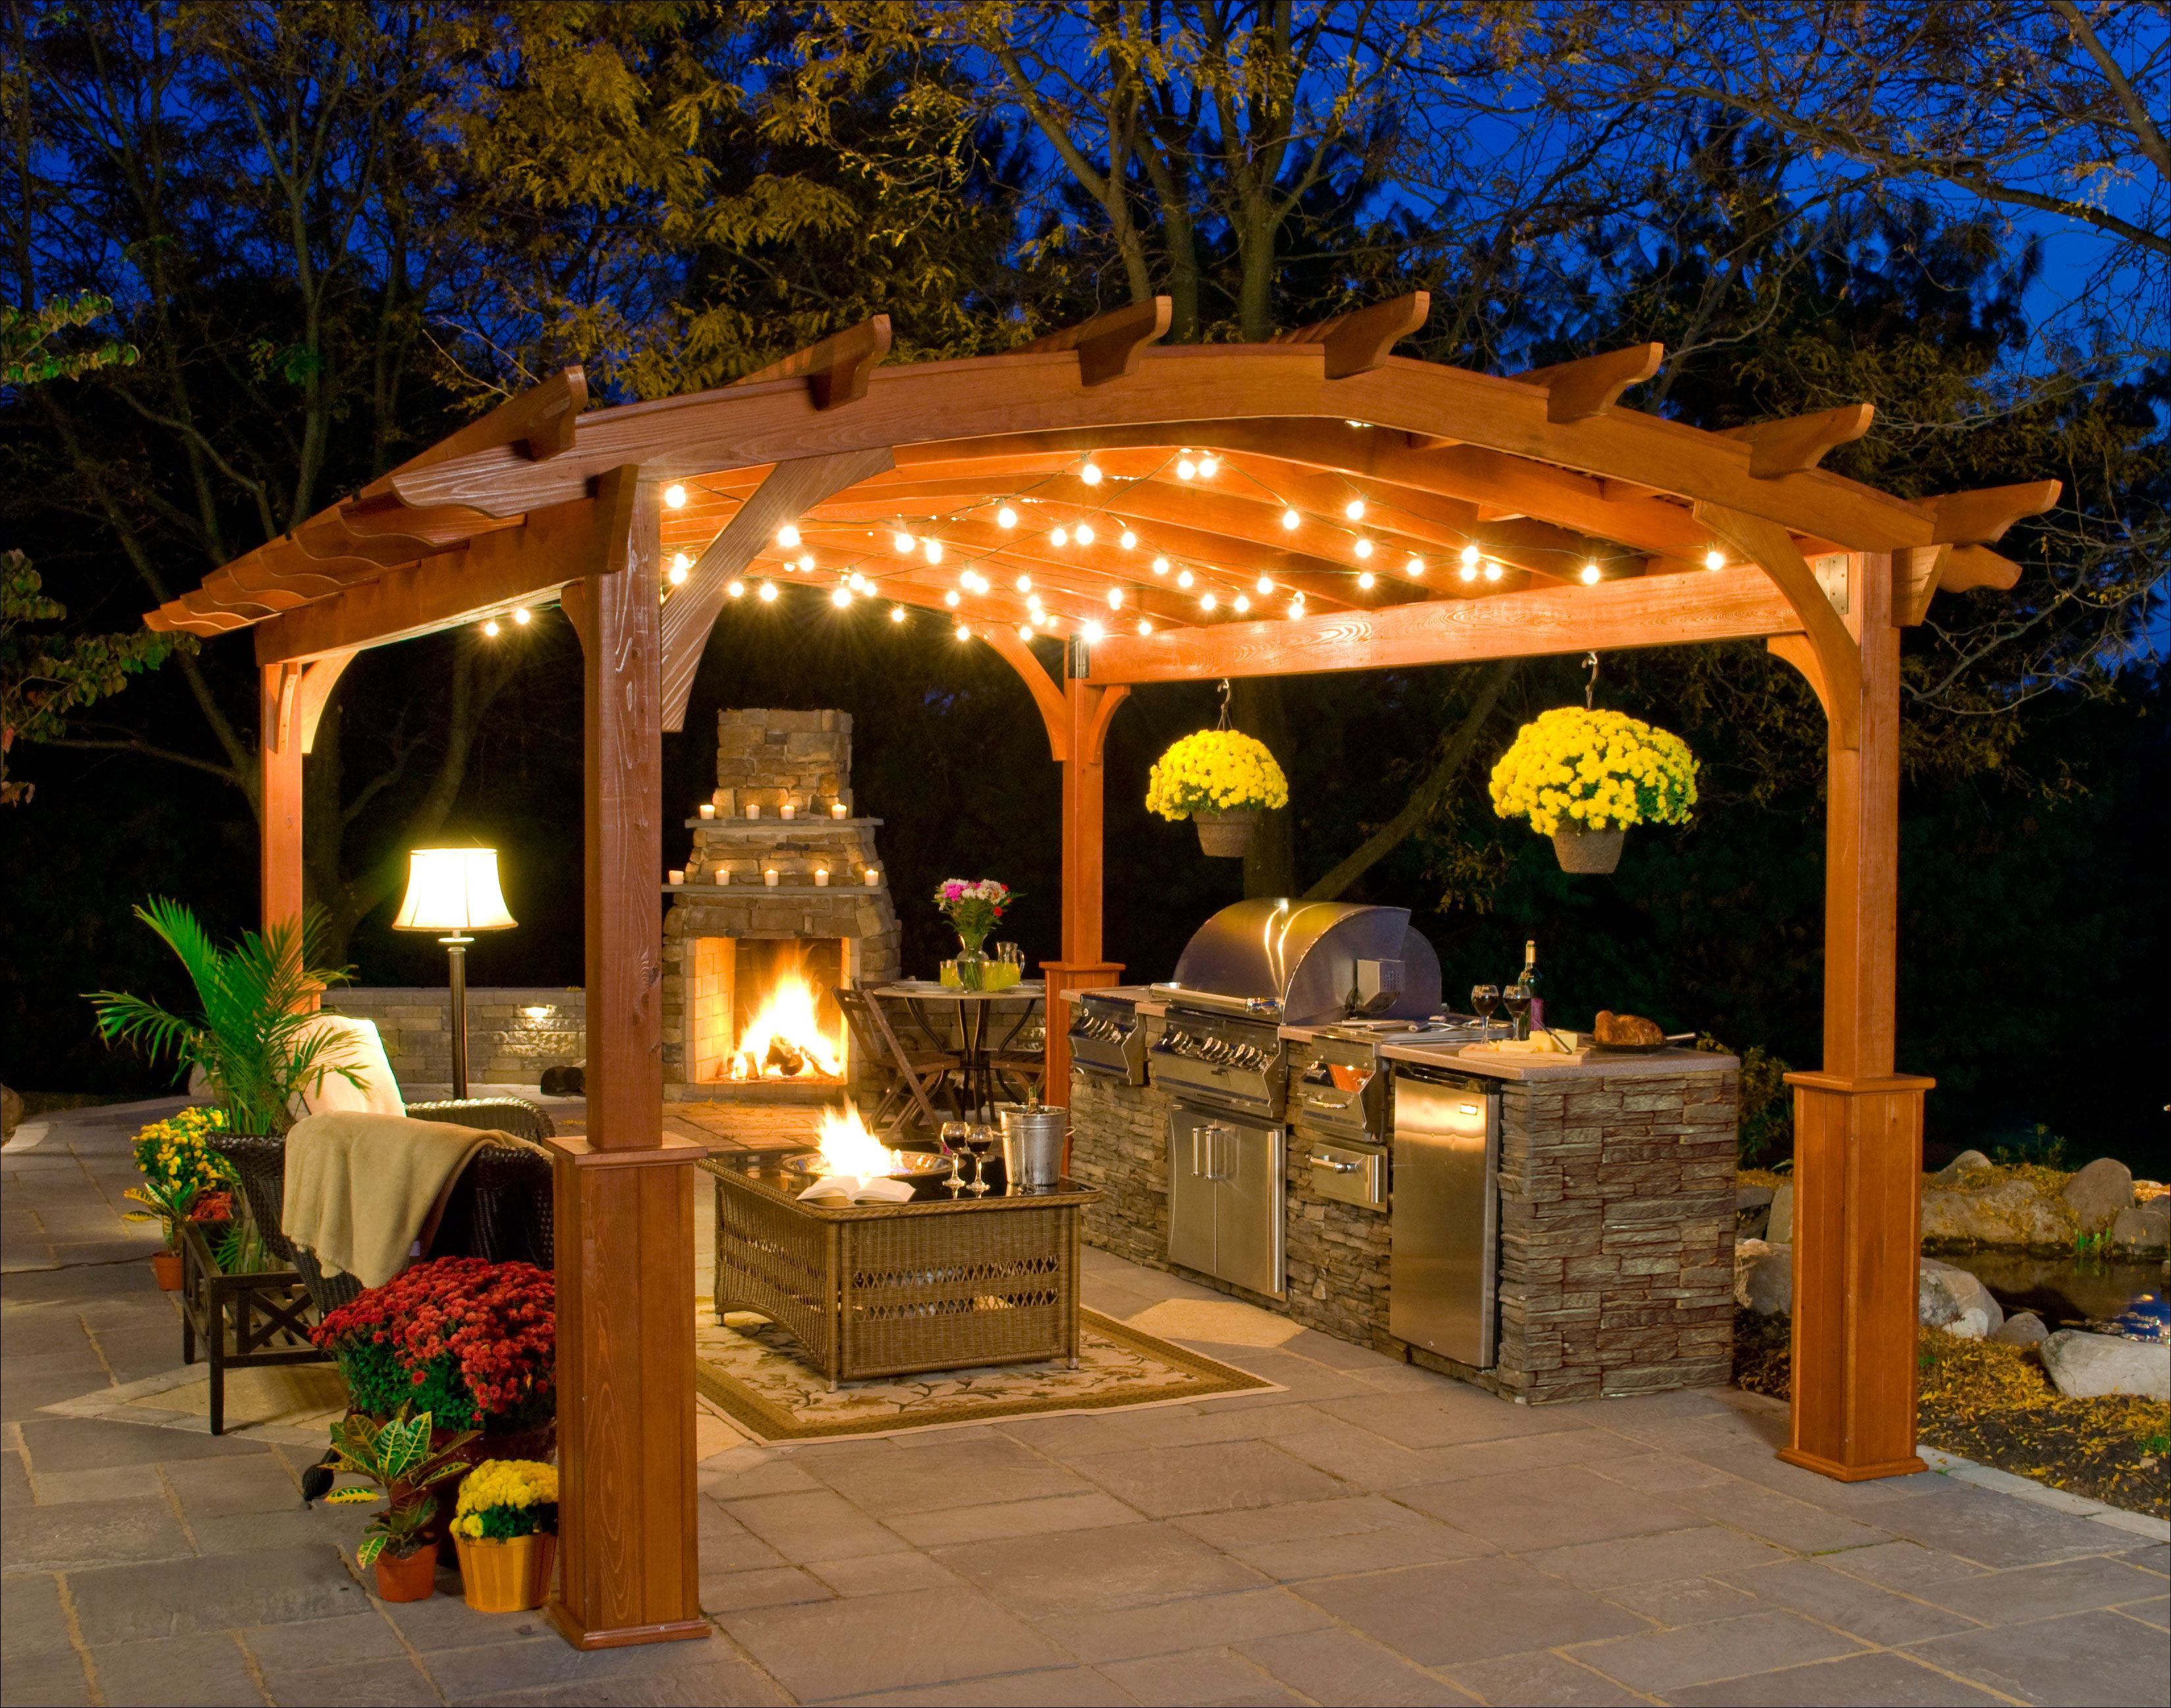 Patio Gazebo Kitchen Ideas Home Design Ideas Outdoor Fireplace